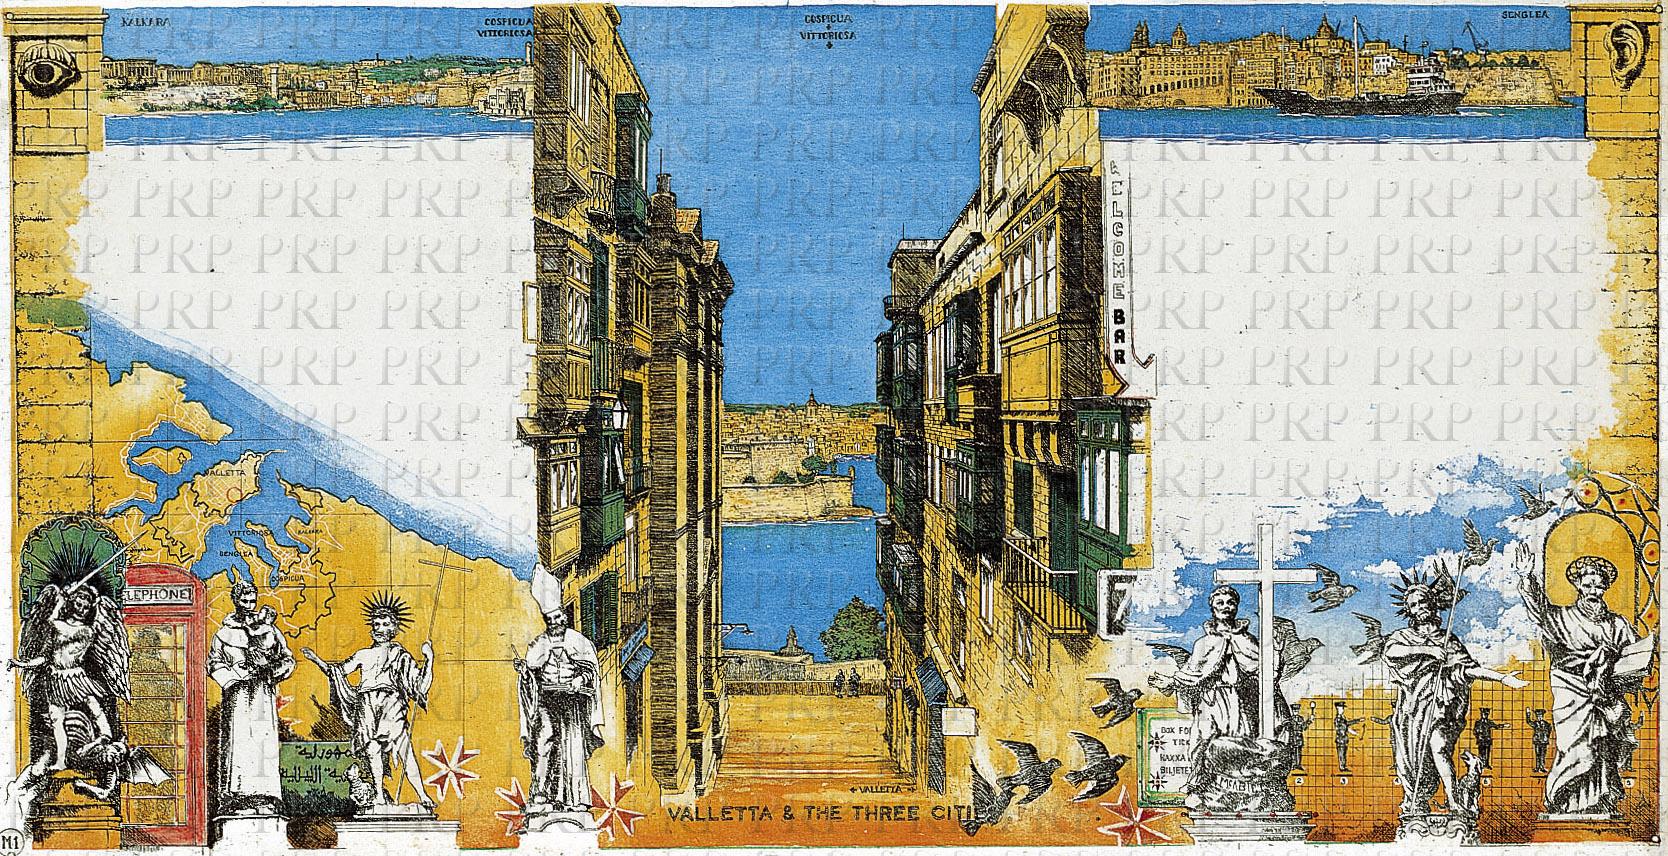 Rolf Weijburg Valletta and the Three Cities